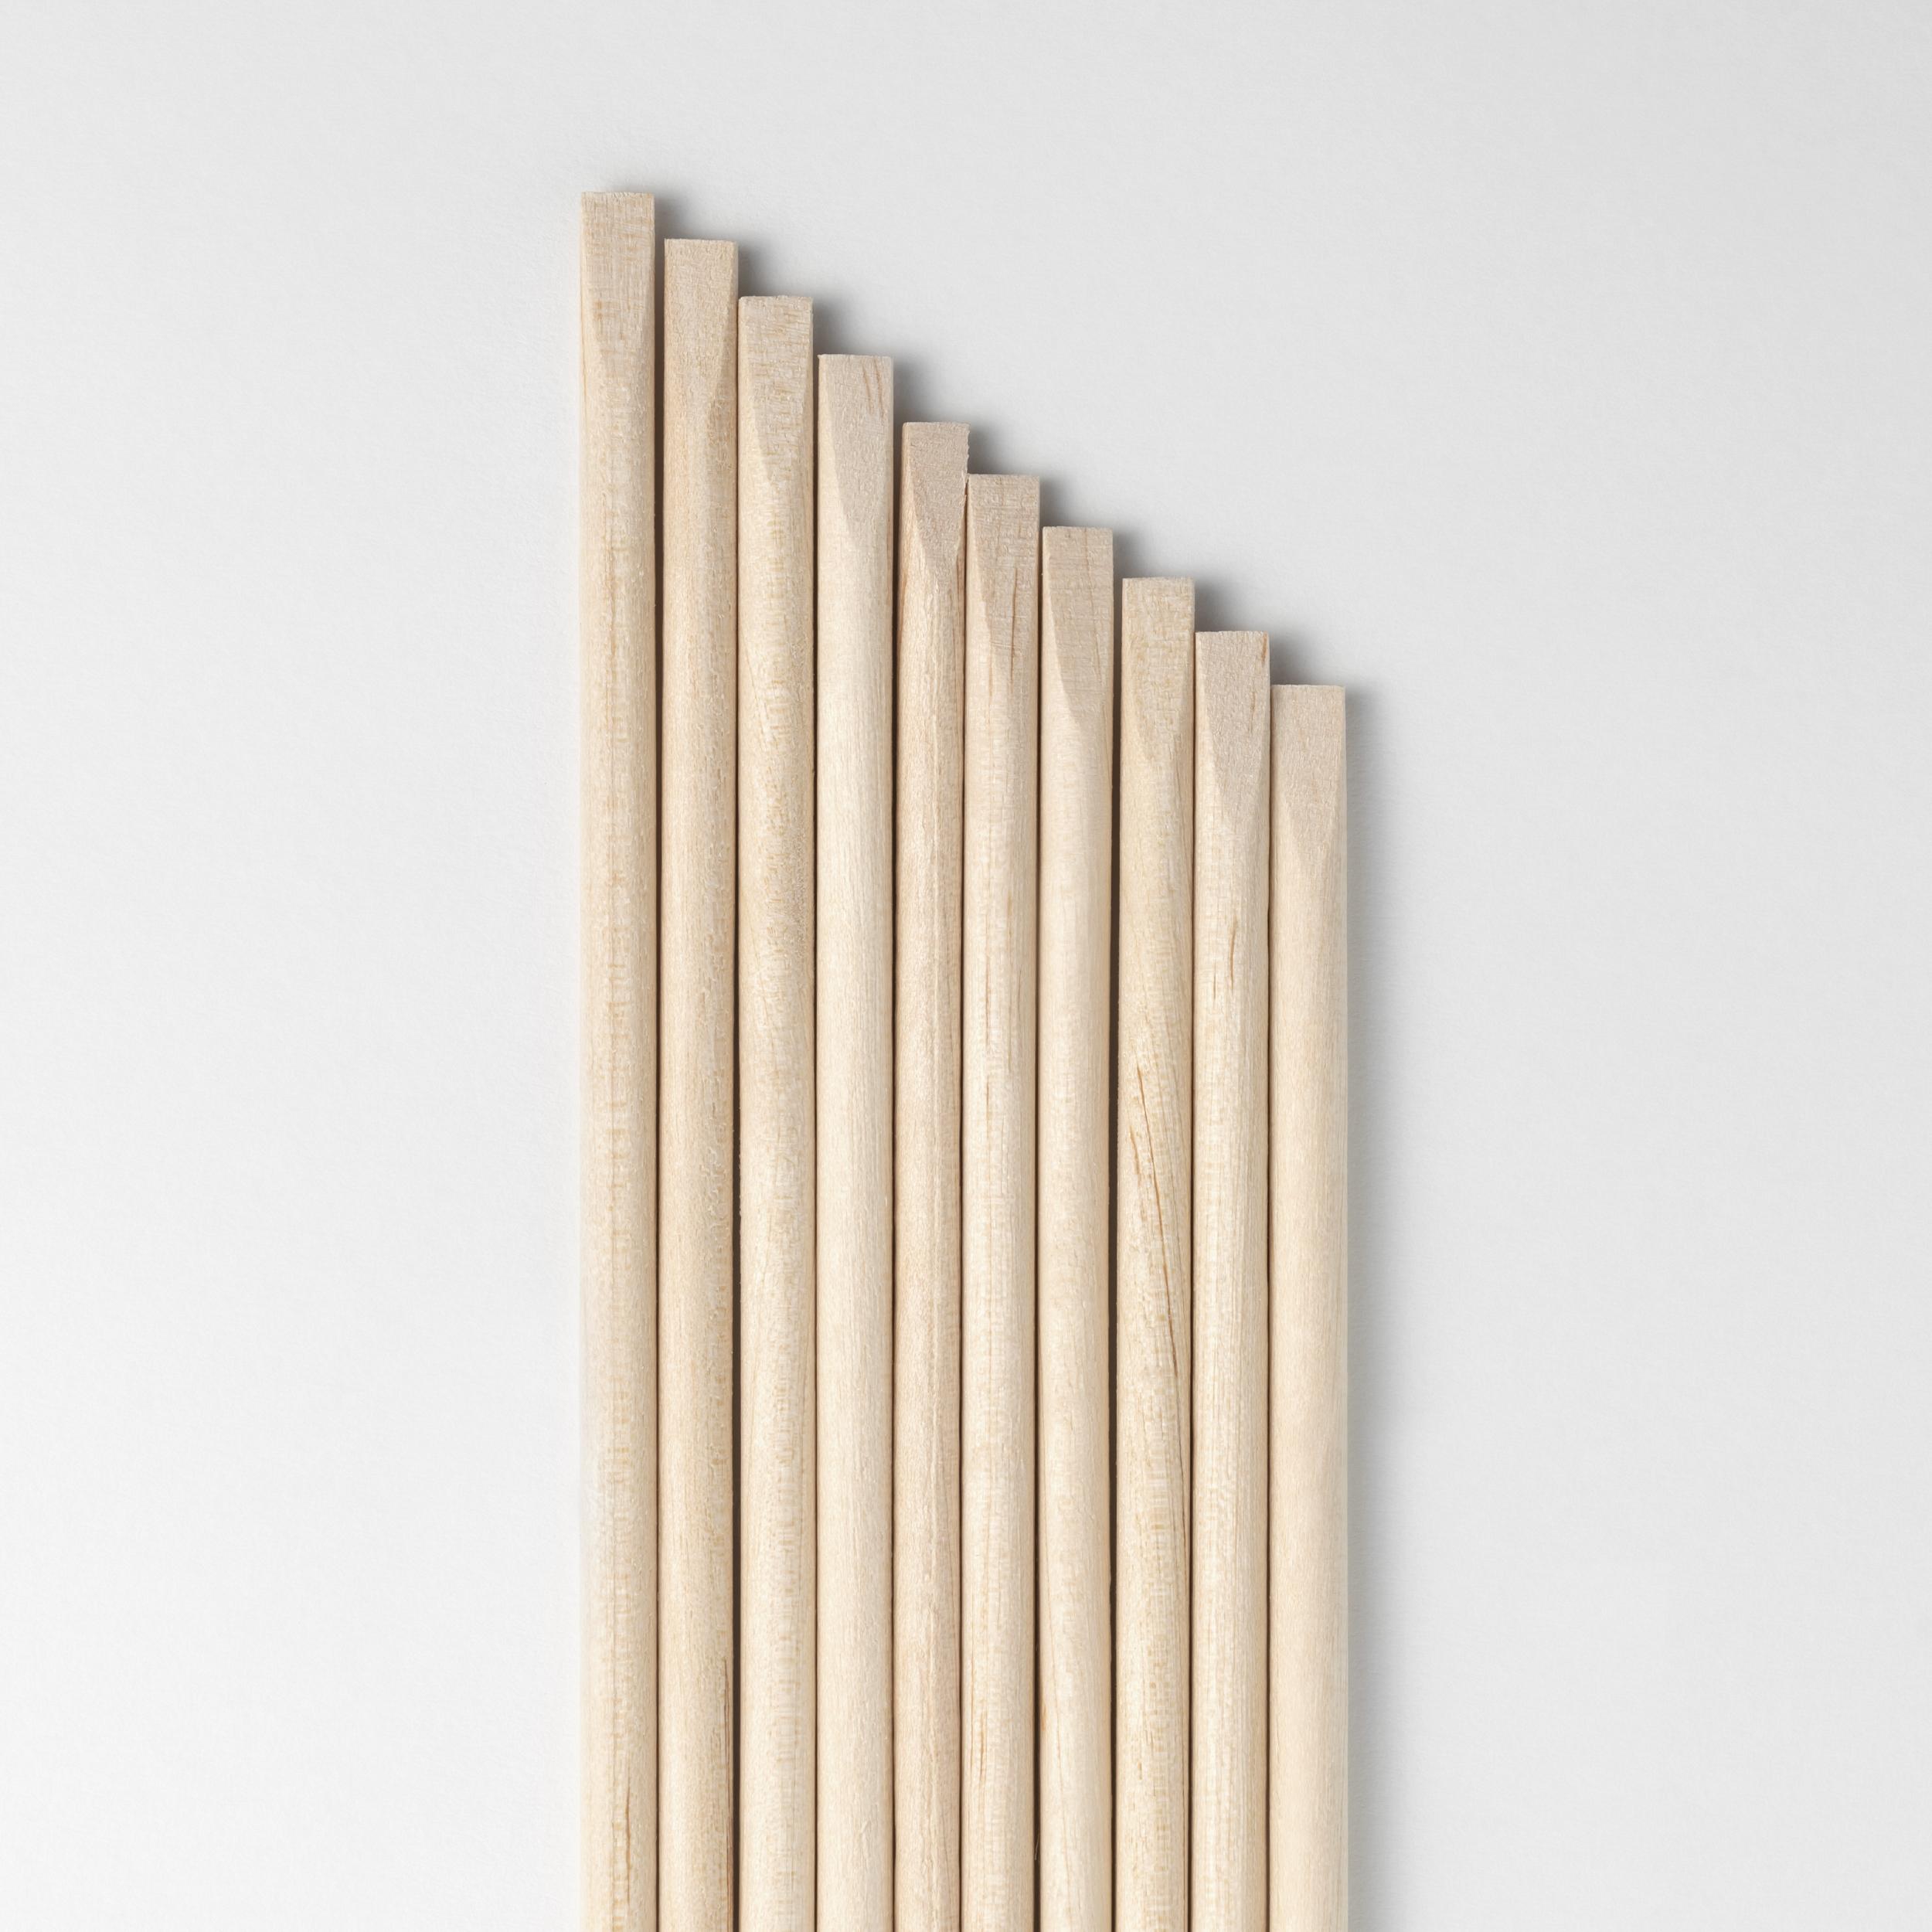 Gel Nail Wood Stick|ジェルネイル ウッドスティック|10本セット画像